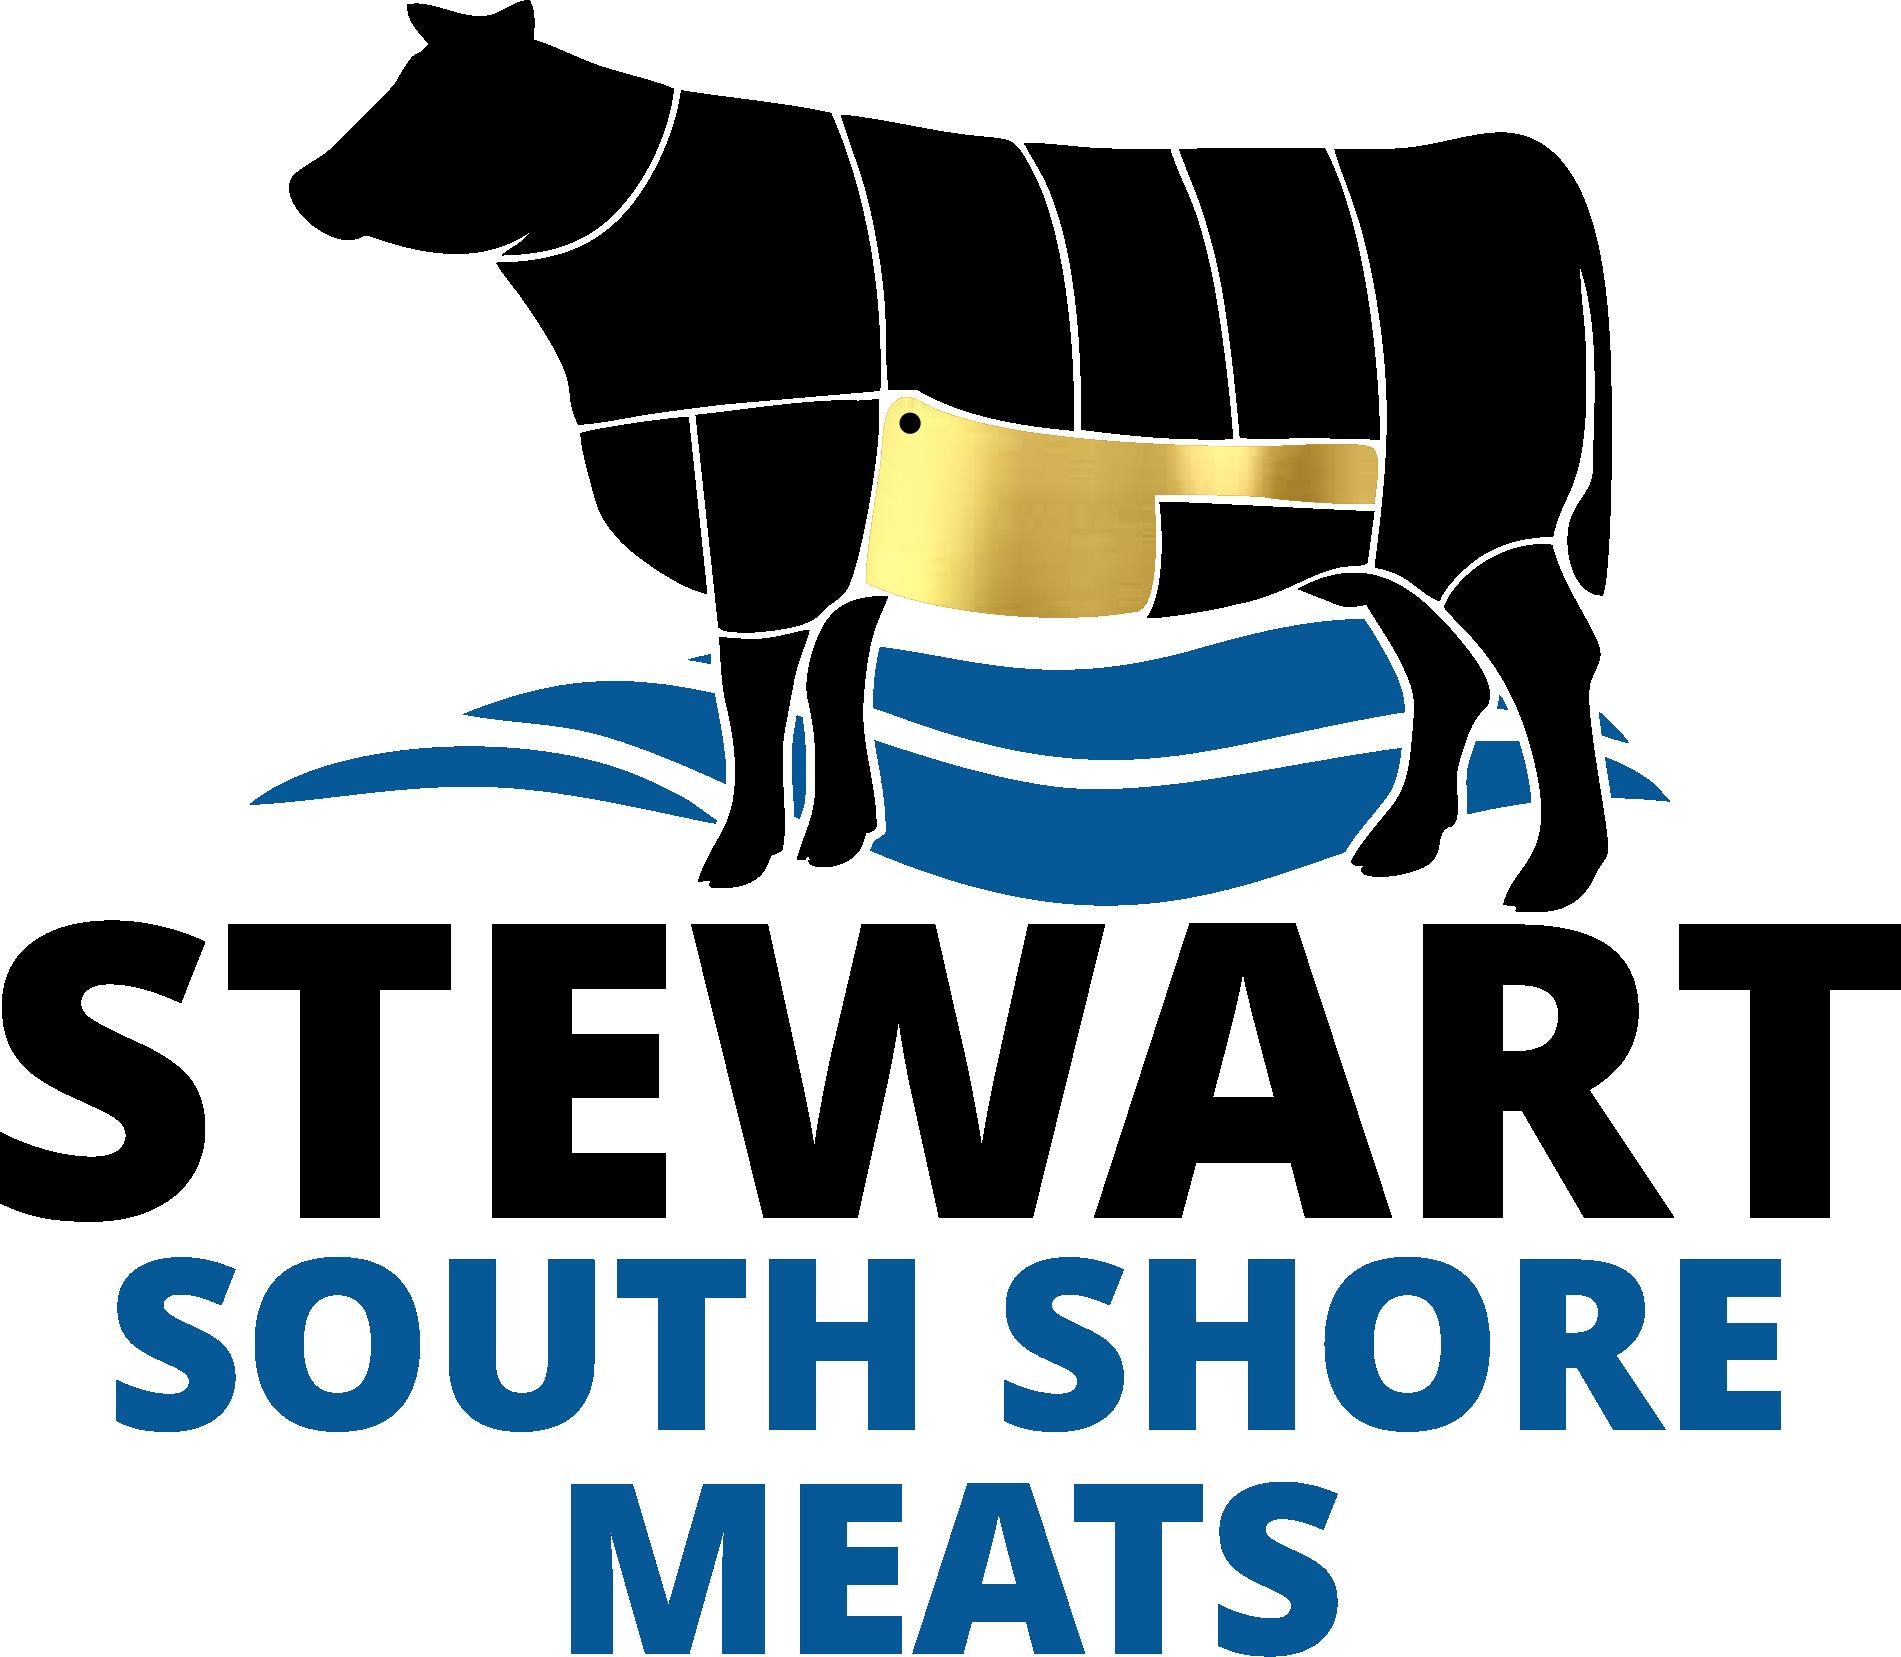 Stewart South Shore Meats Logo